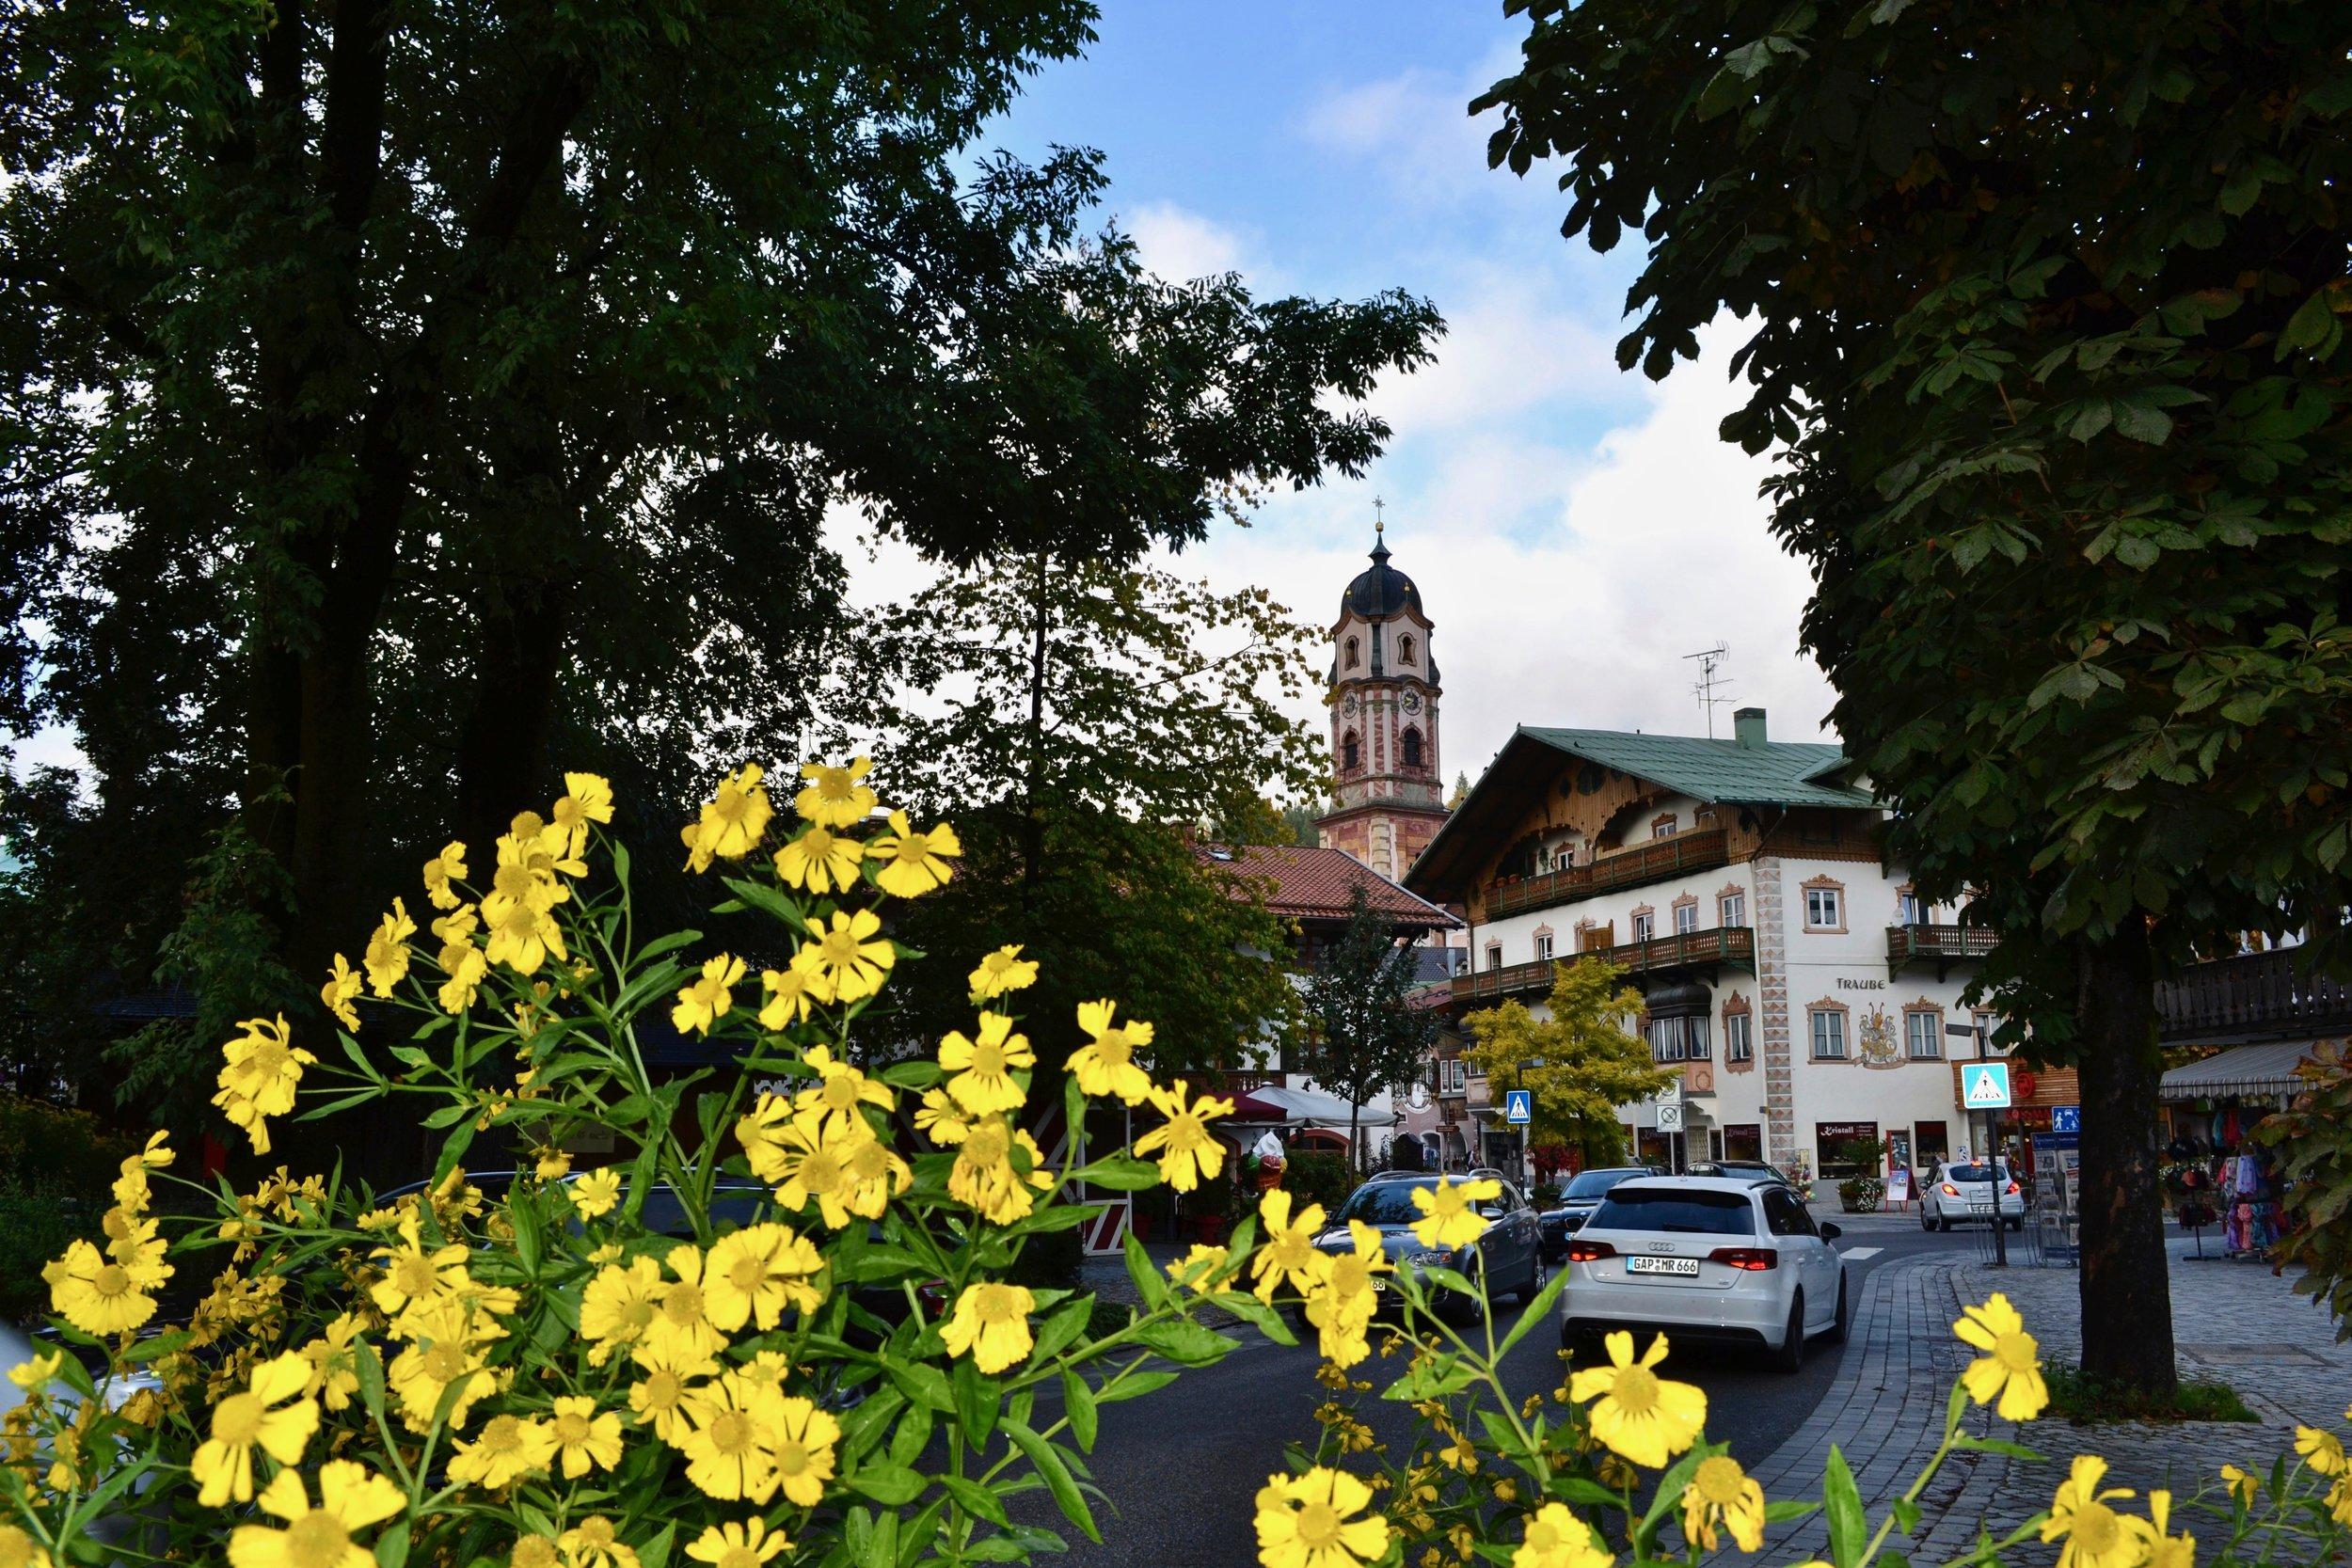 Mittenwald Parish Church Tower